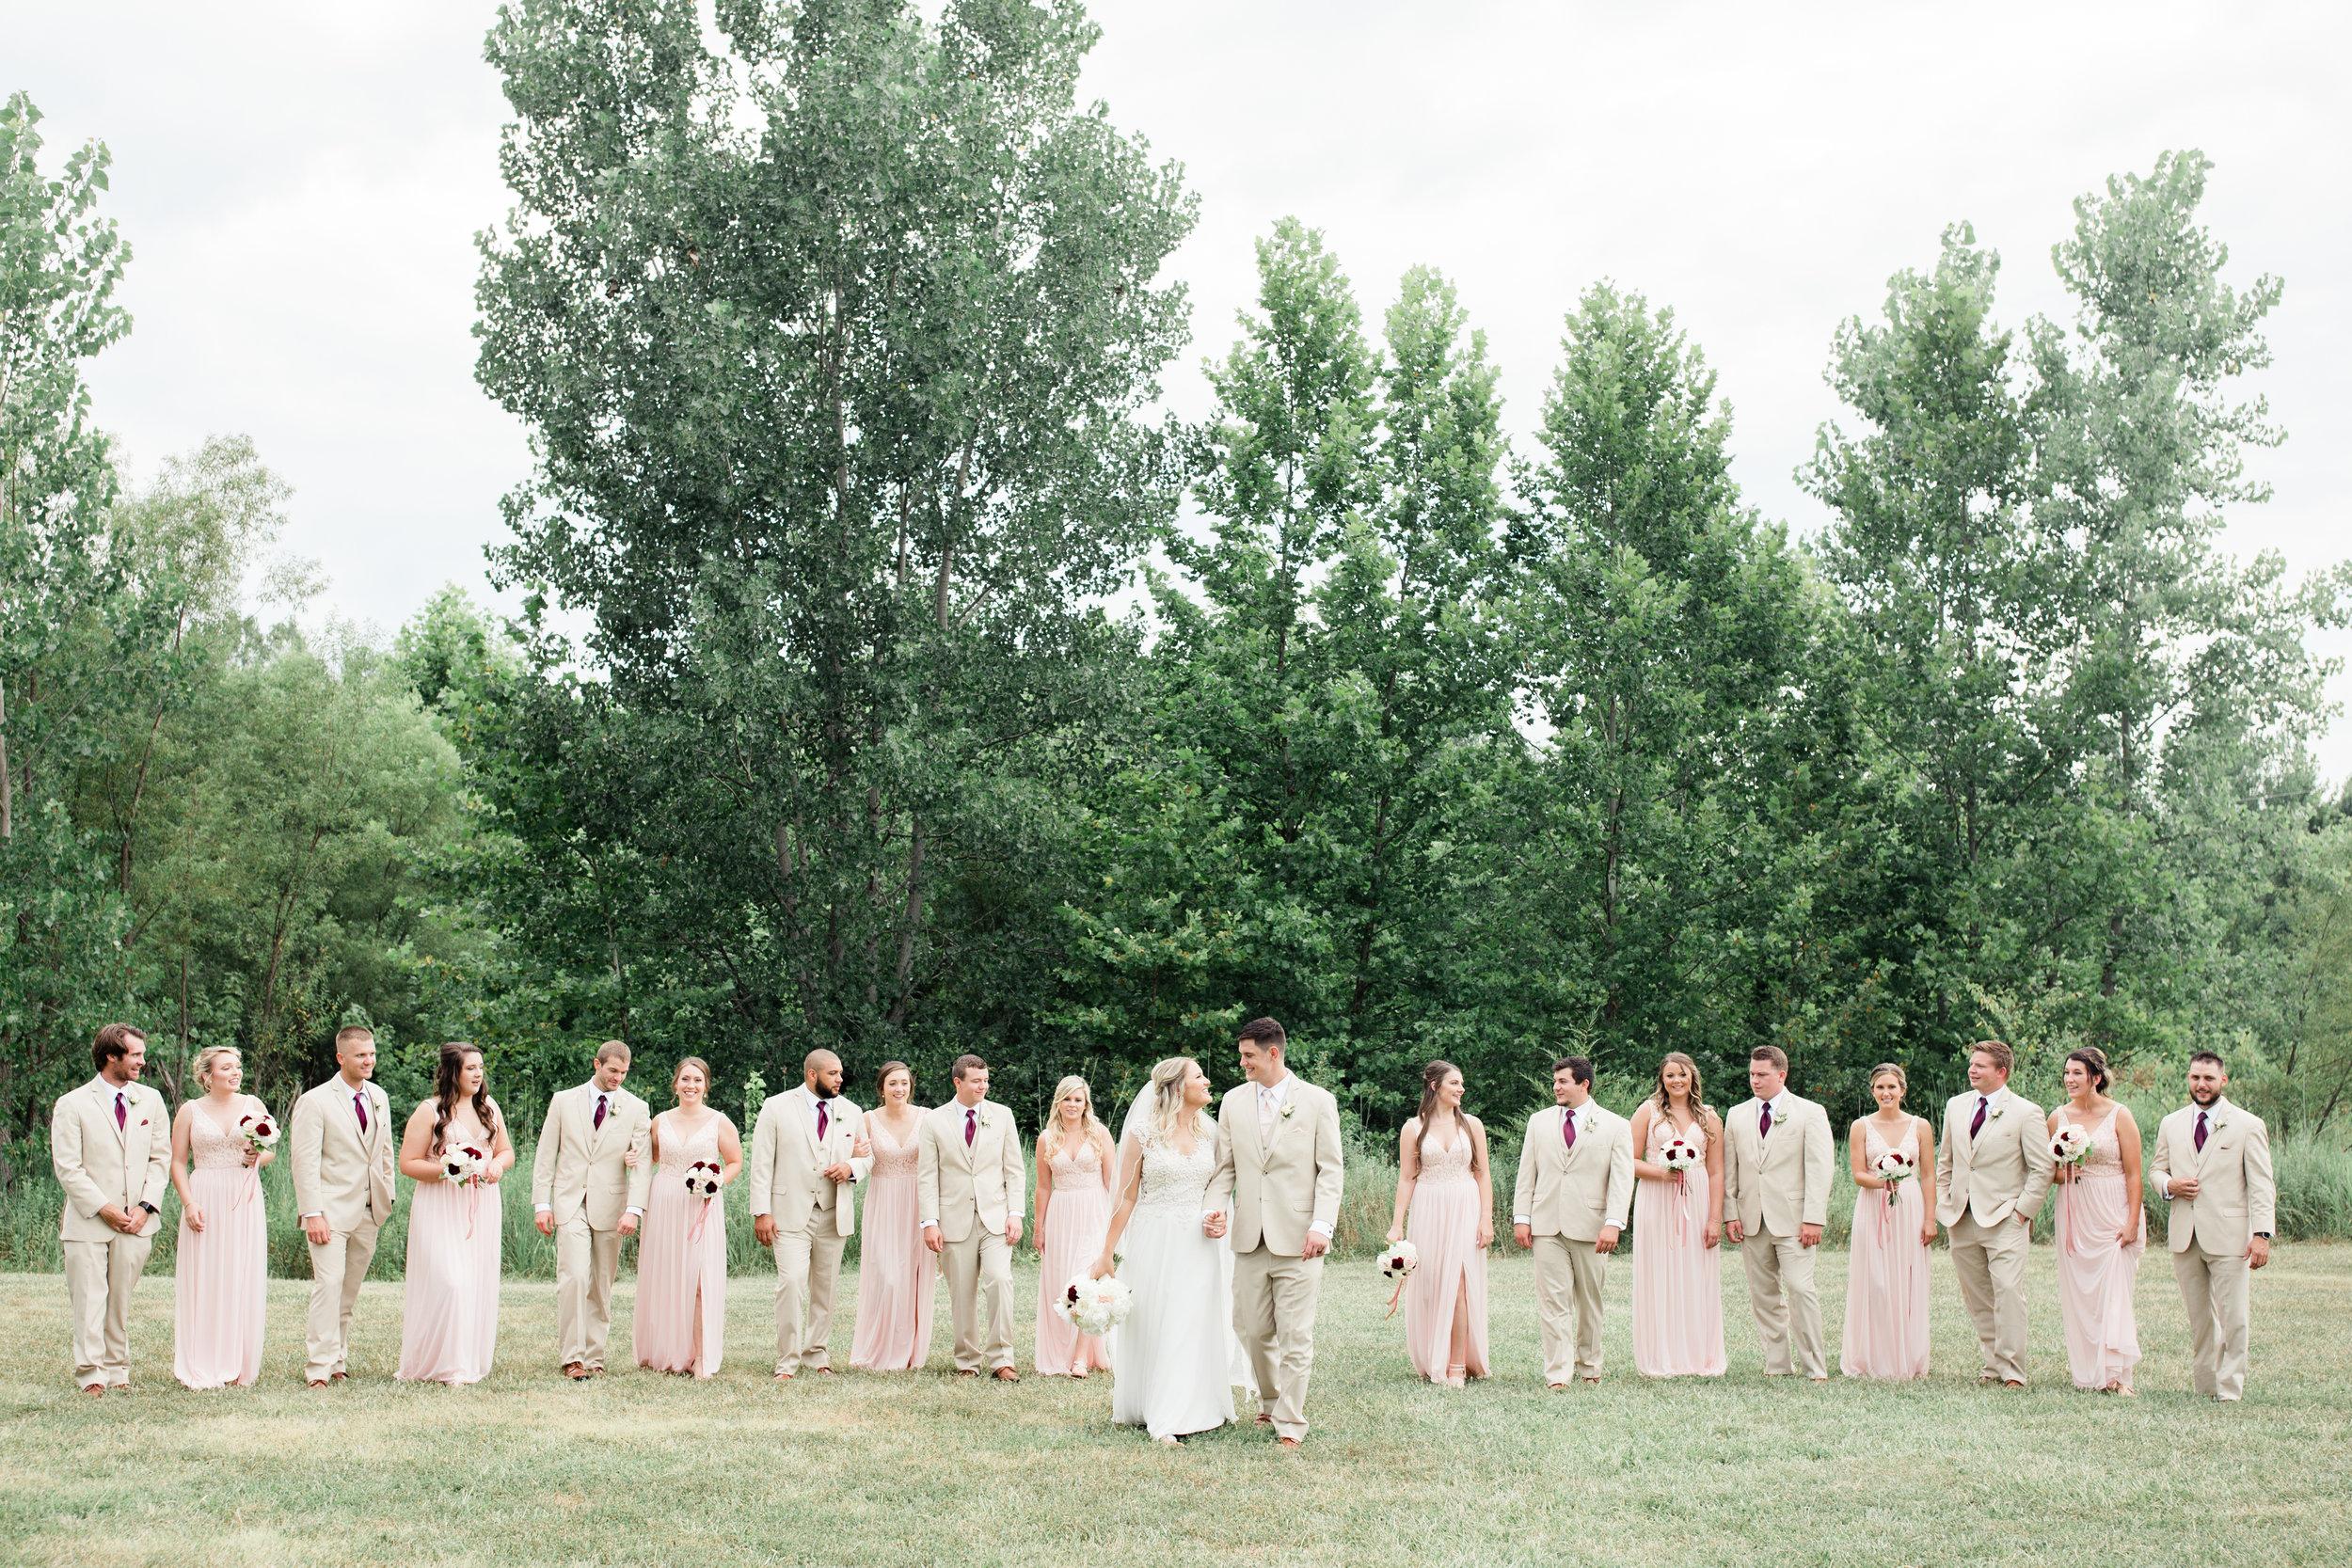 Dorothy_Louise_Photography_Marissa_Jake_Wentzville_MO_Wedding-125-2.jpg